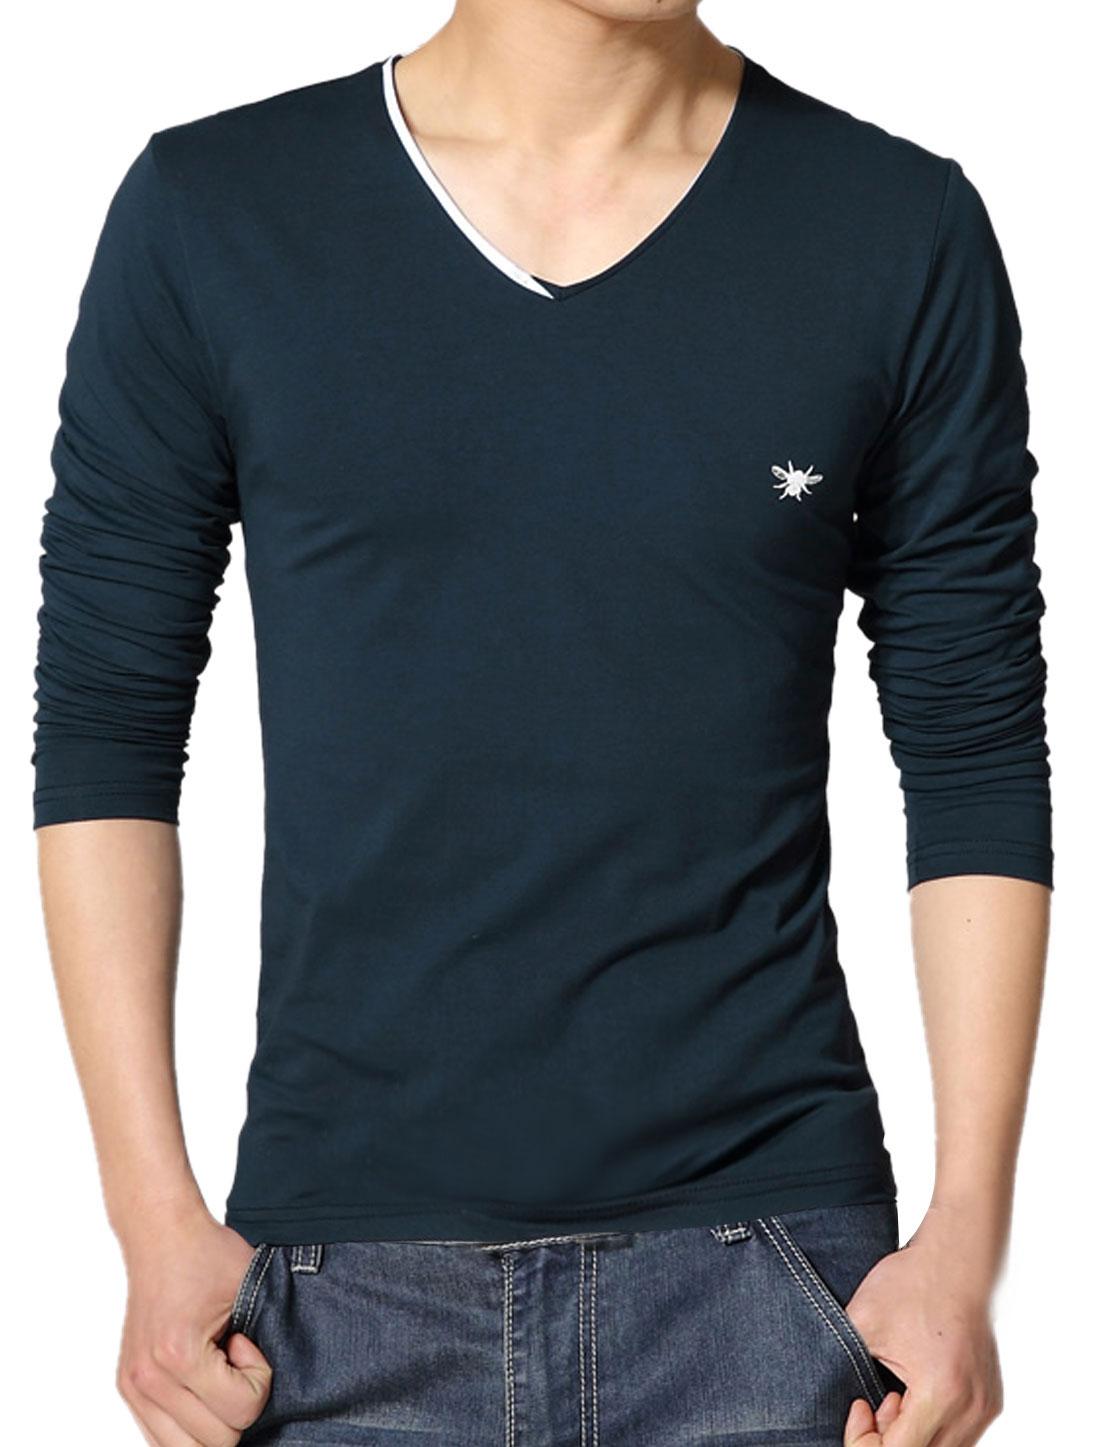 Men V Neck Long Sleeves Slim Fit Tee Shirt Blue S